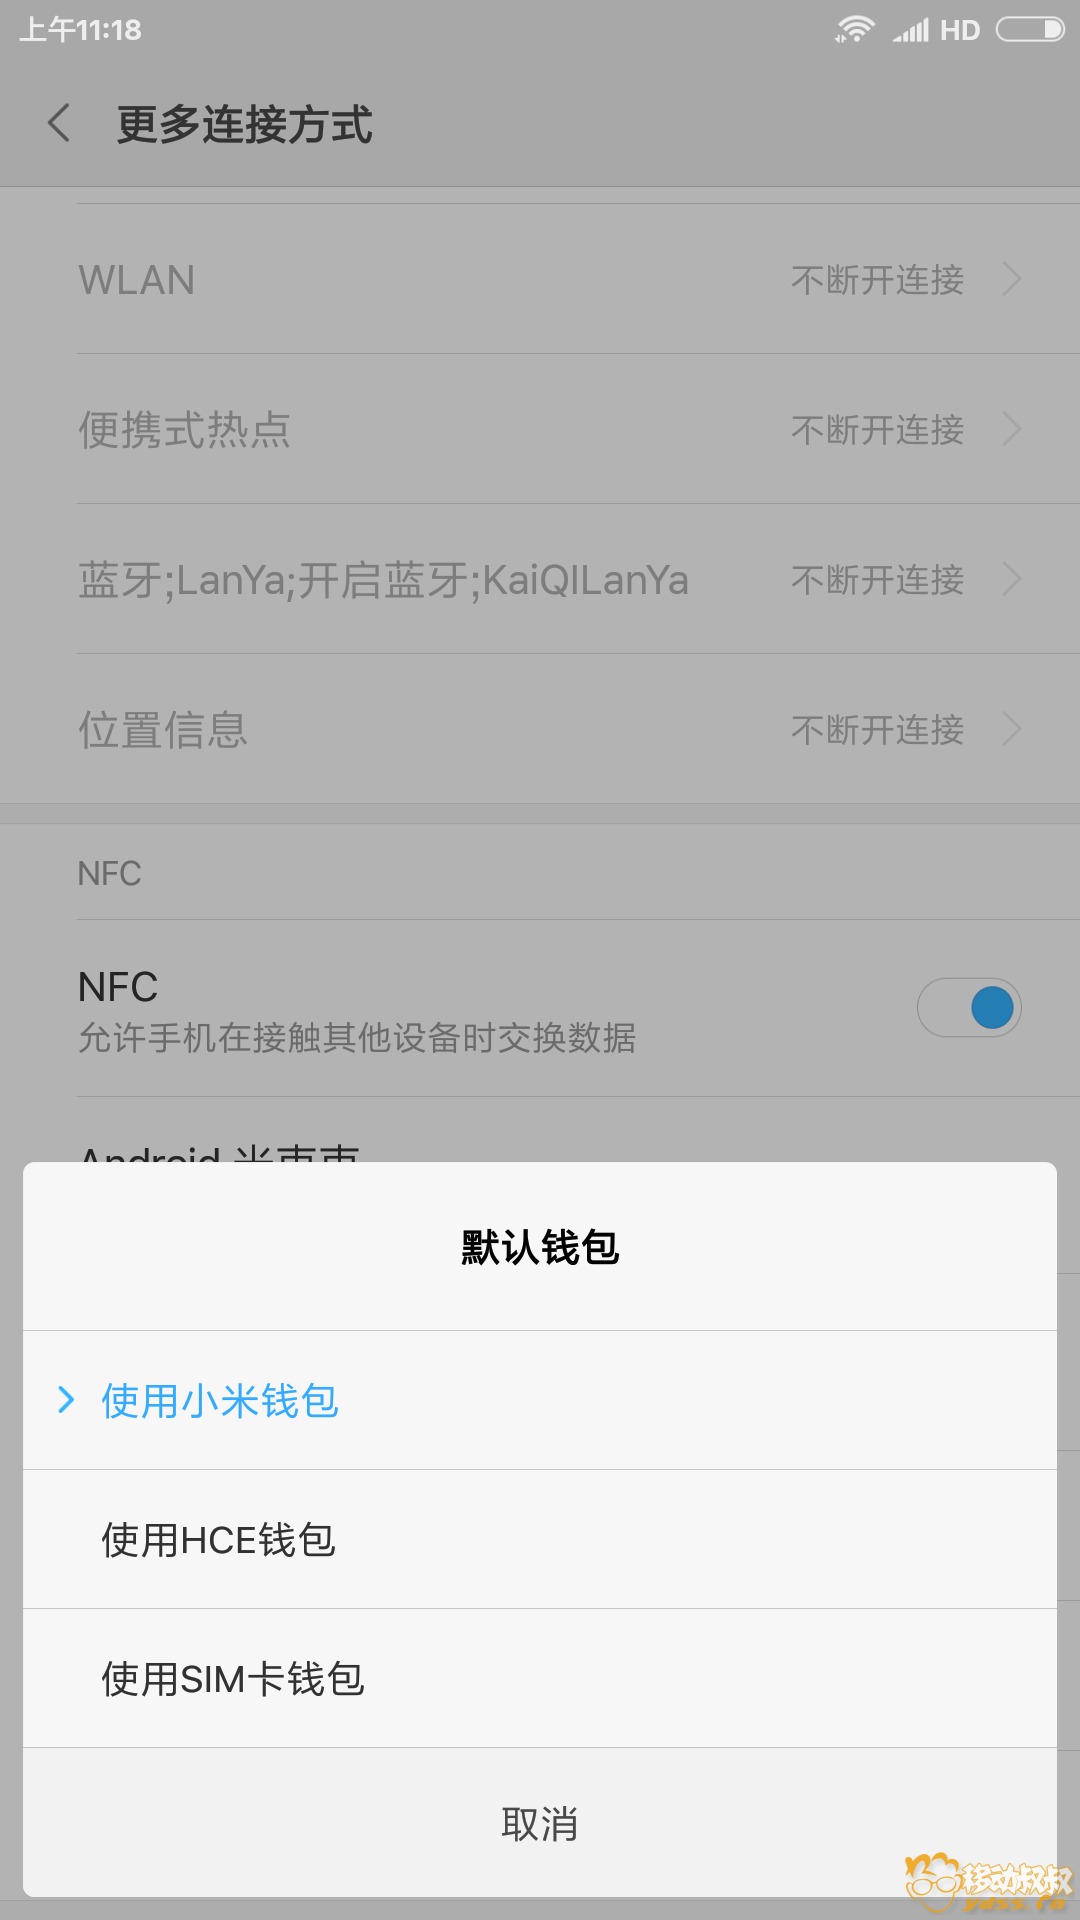 Screenshot_2018-05-04-11-18-44-442_com.android.settings.png